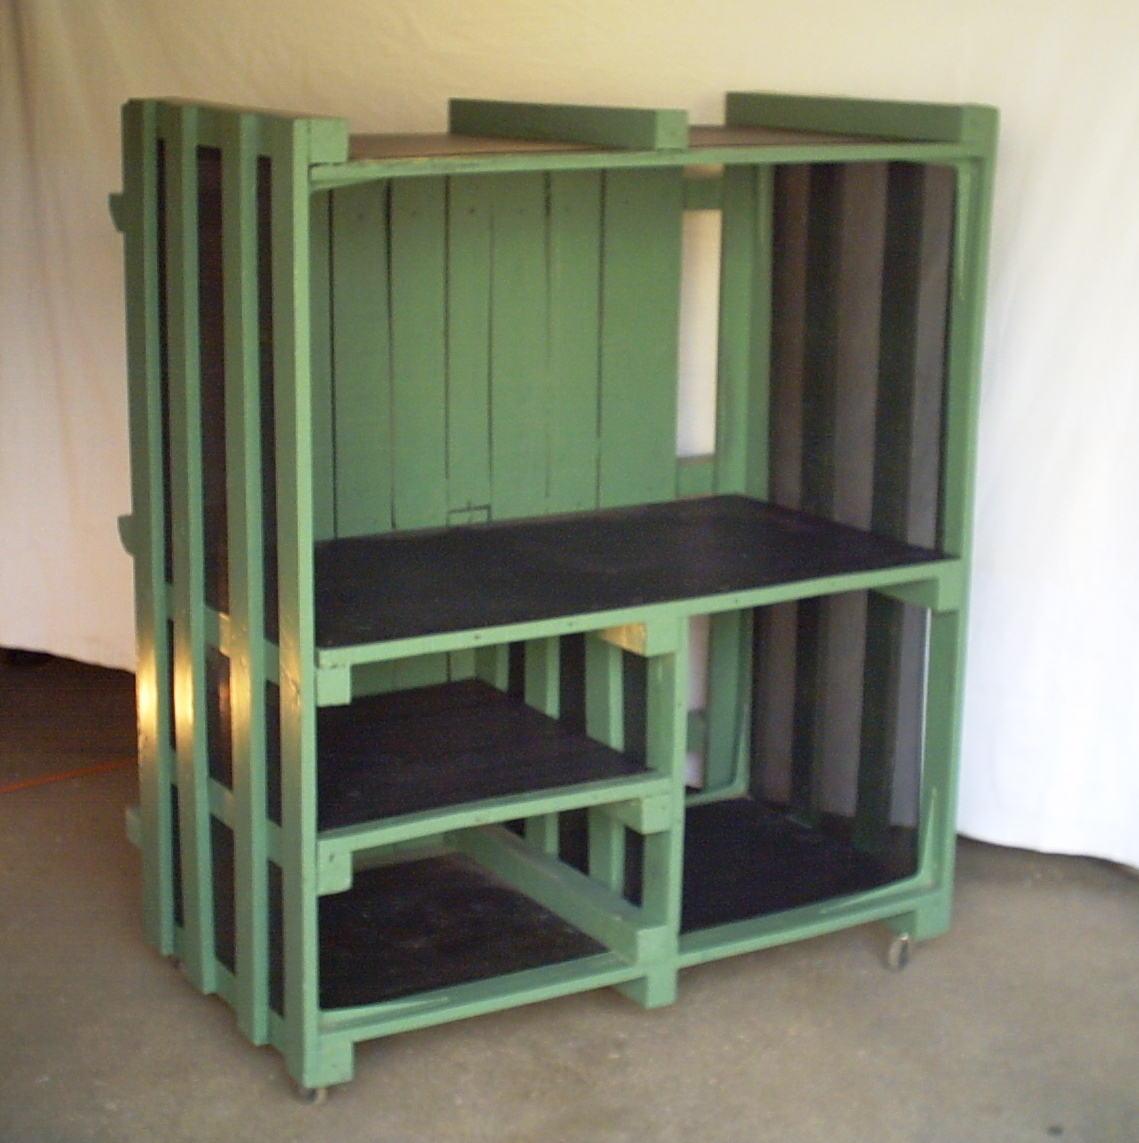 Plan meuble en bois de palette uc88 jornalagora Meuble en palette